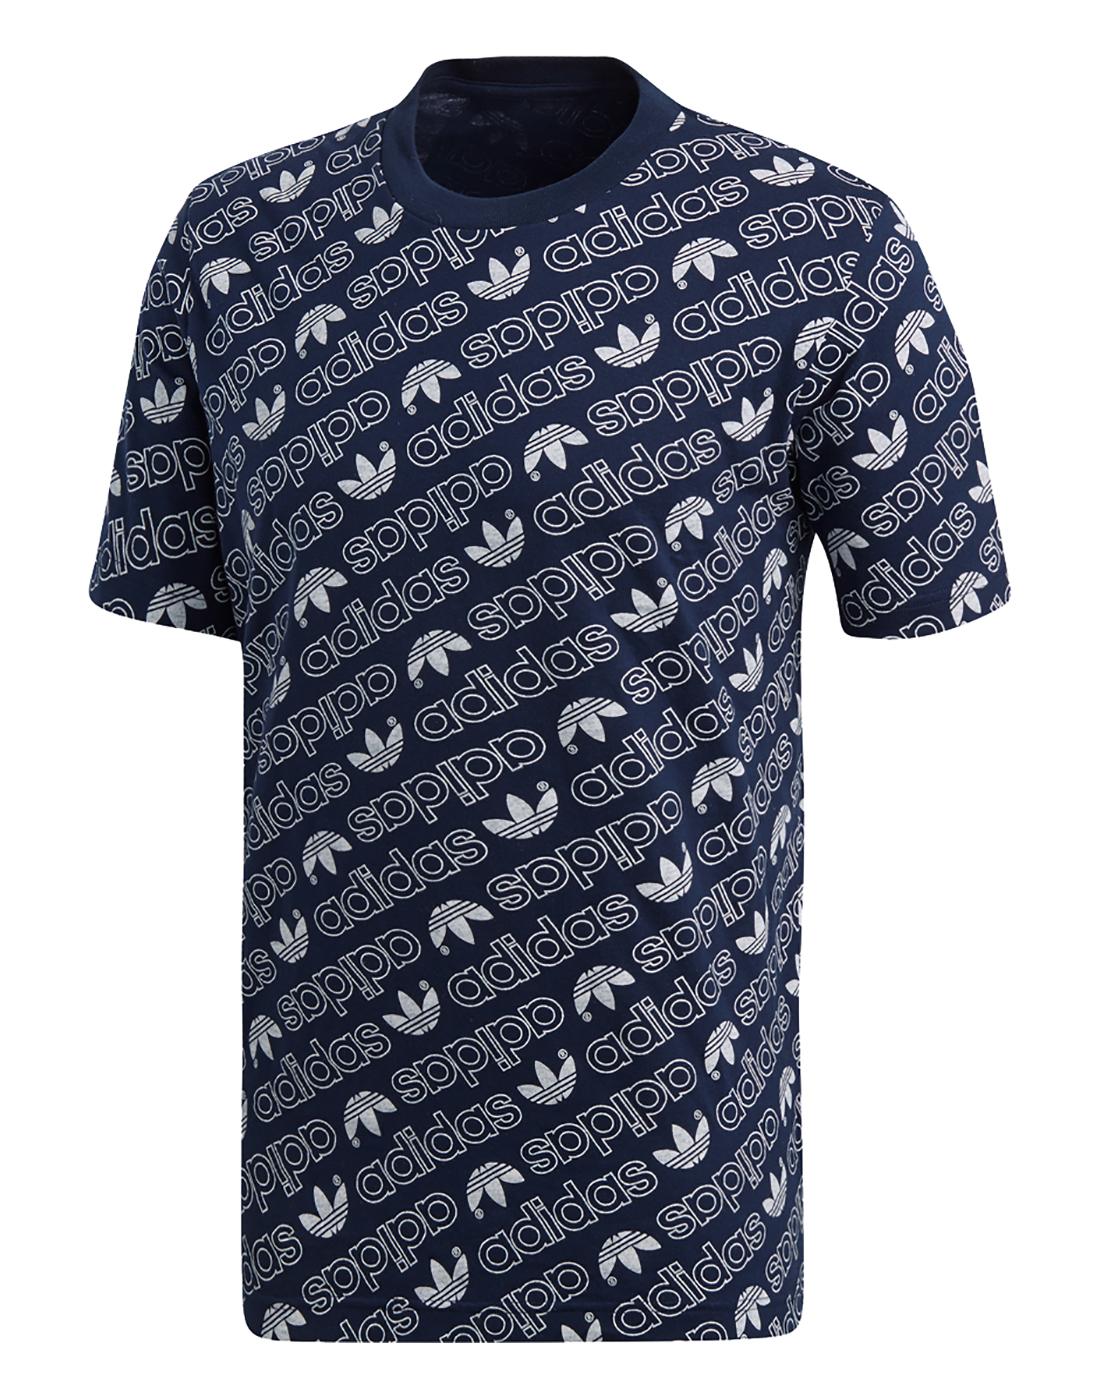 233b99129 Men's Navy adidas Originals Monogram T-Shirt | Life Style Sports